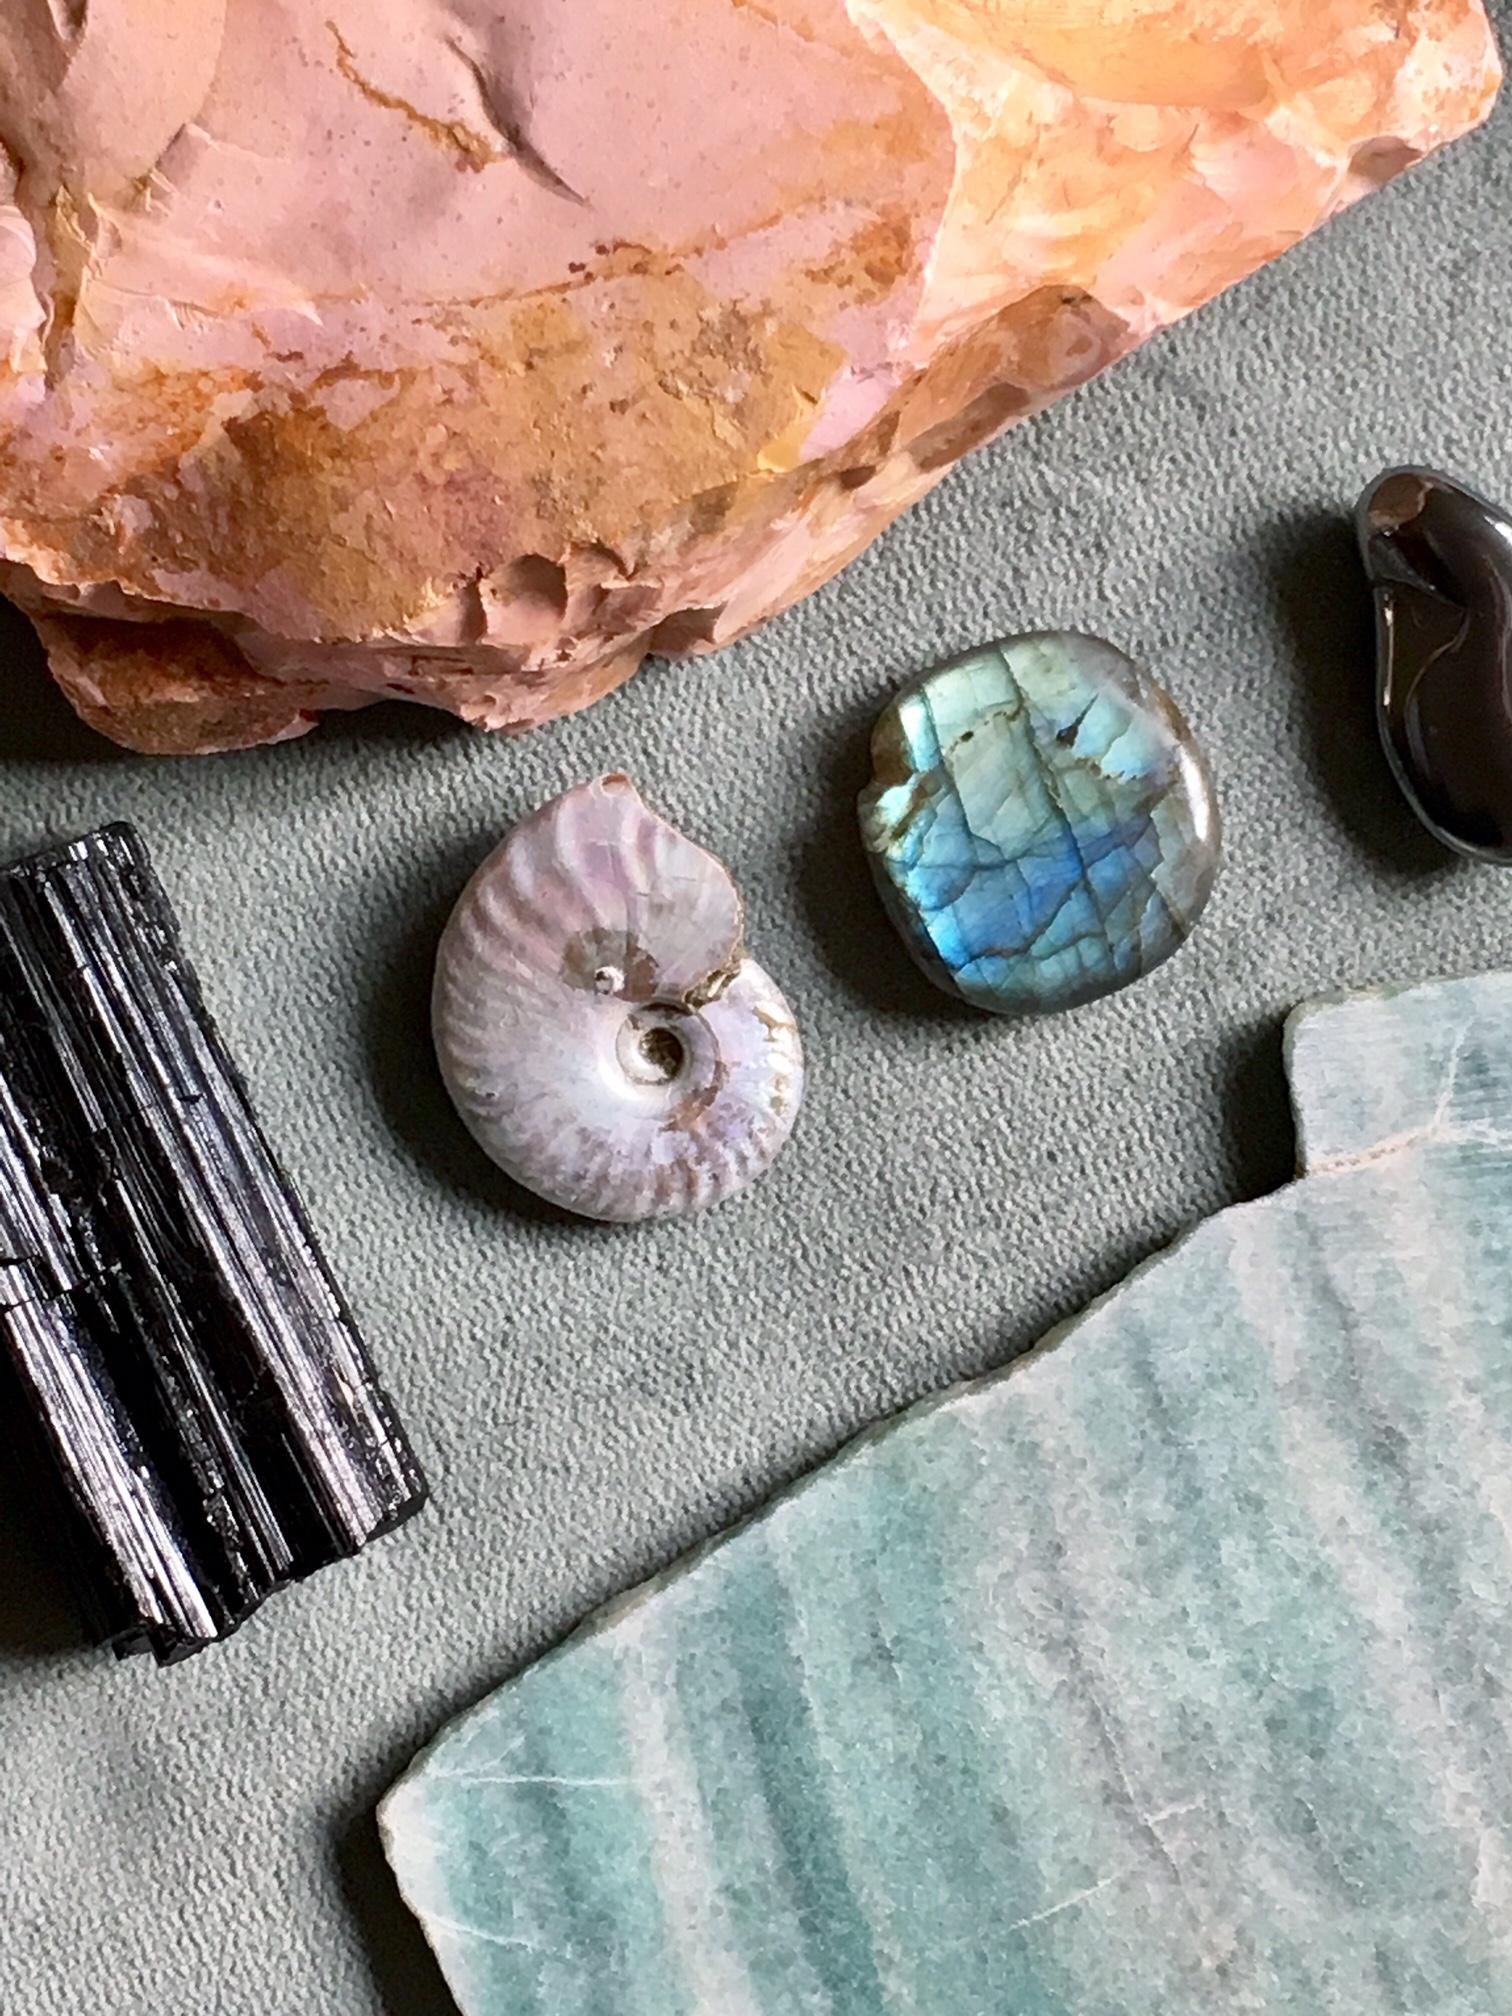 Pink opal, black tourmaline, ammonite, labradorite, hematite, and aventurine